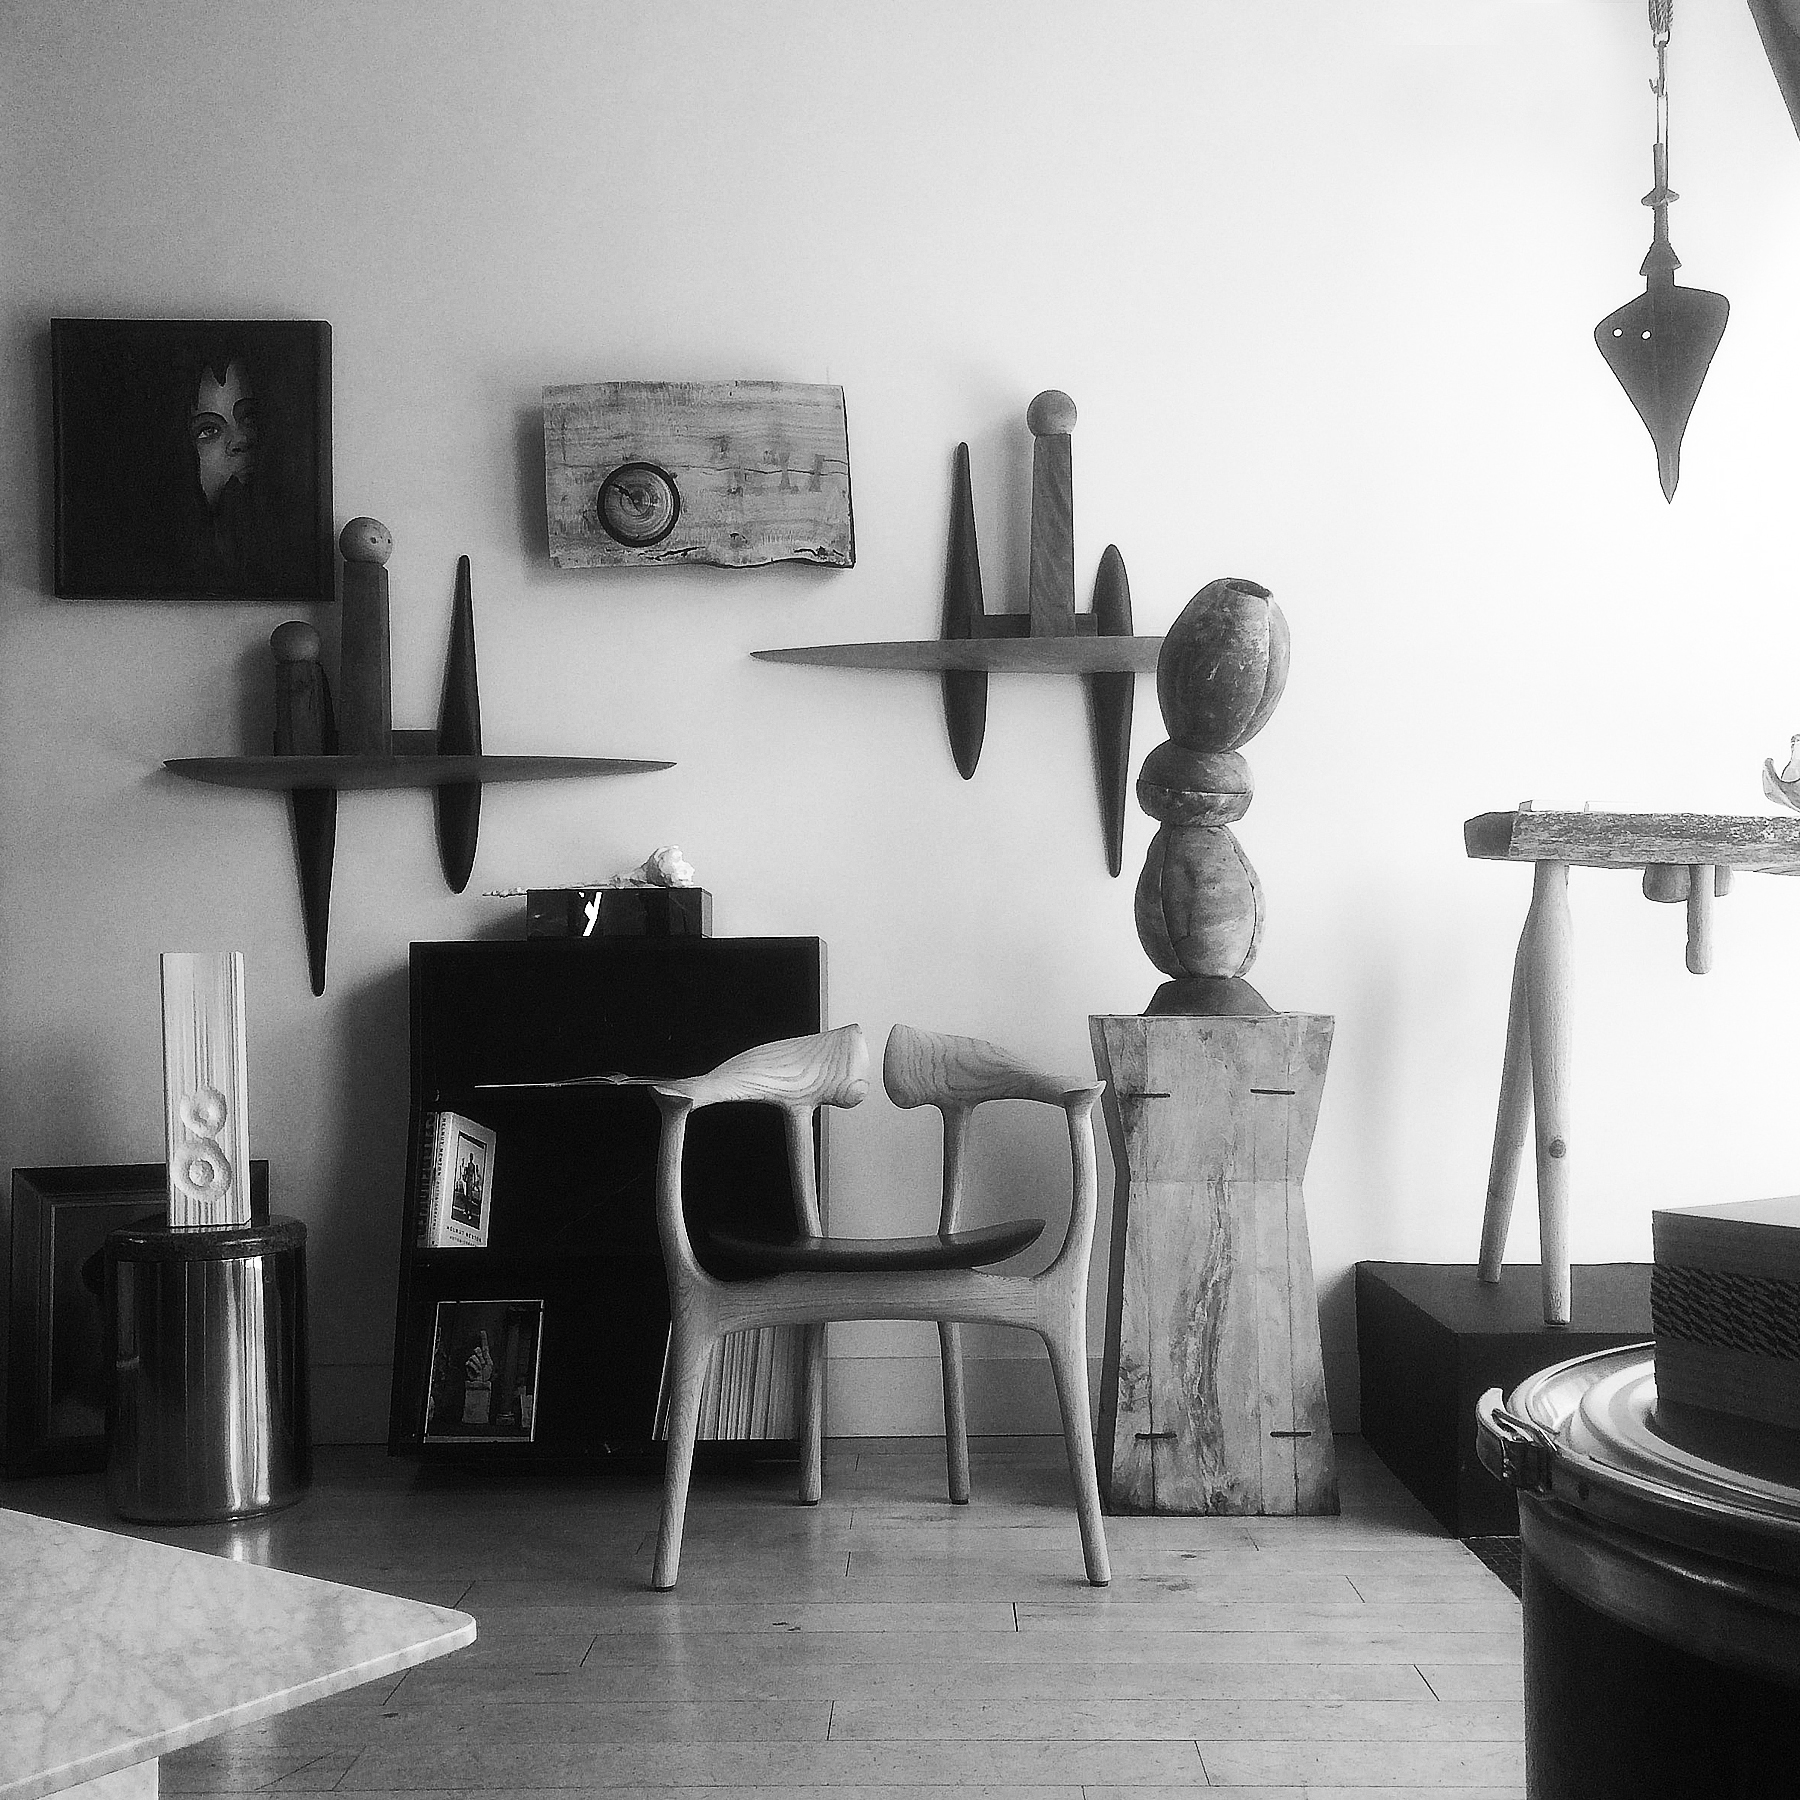 siglo-moderno-brand-history-sculpting-28.jpg